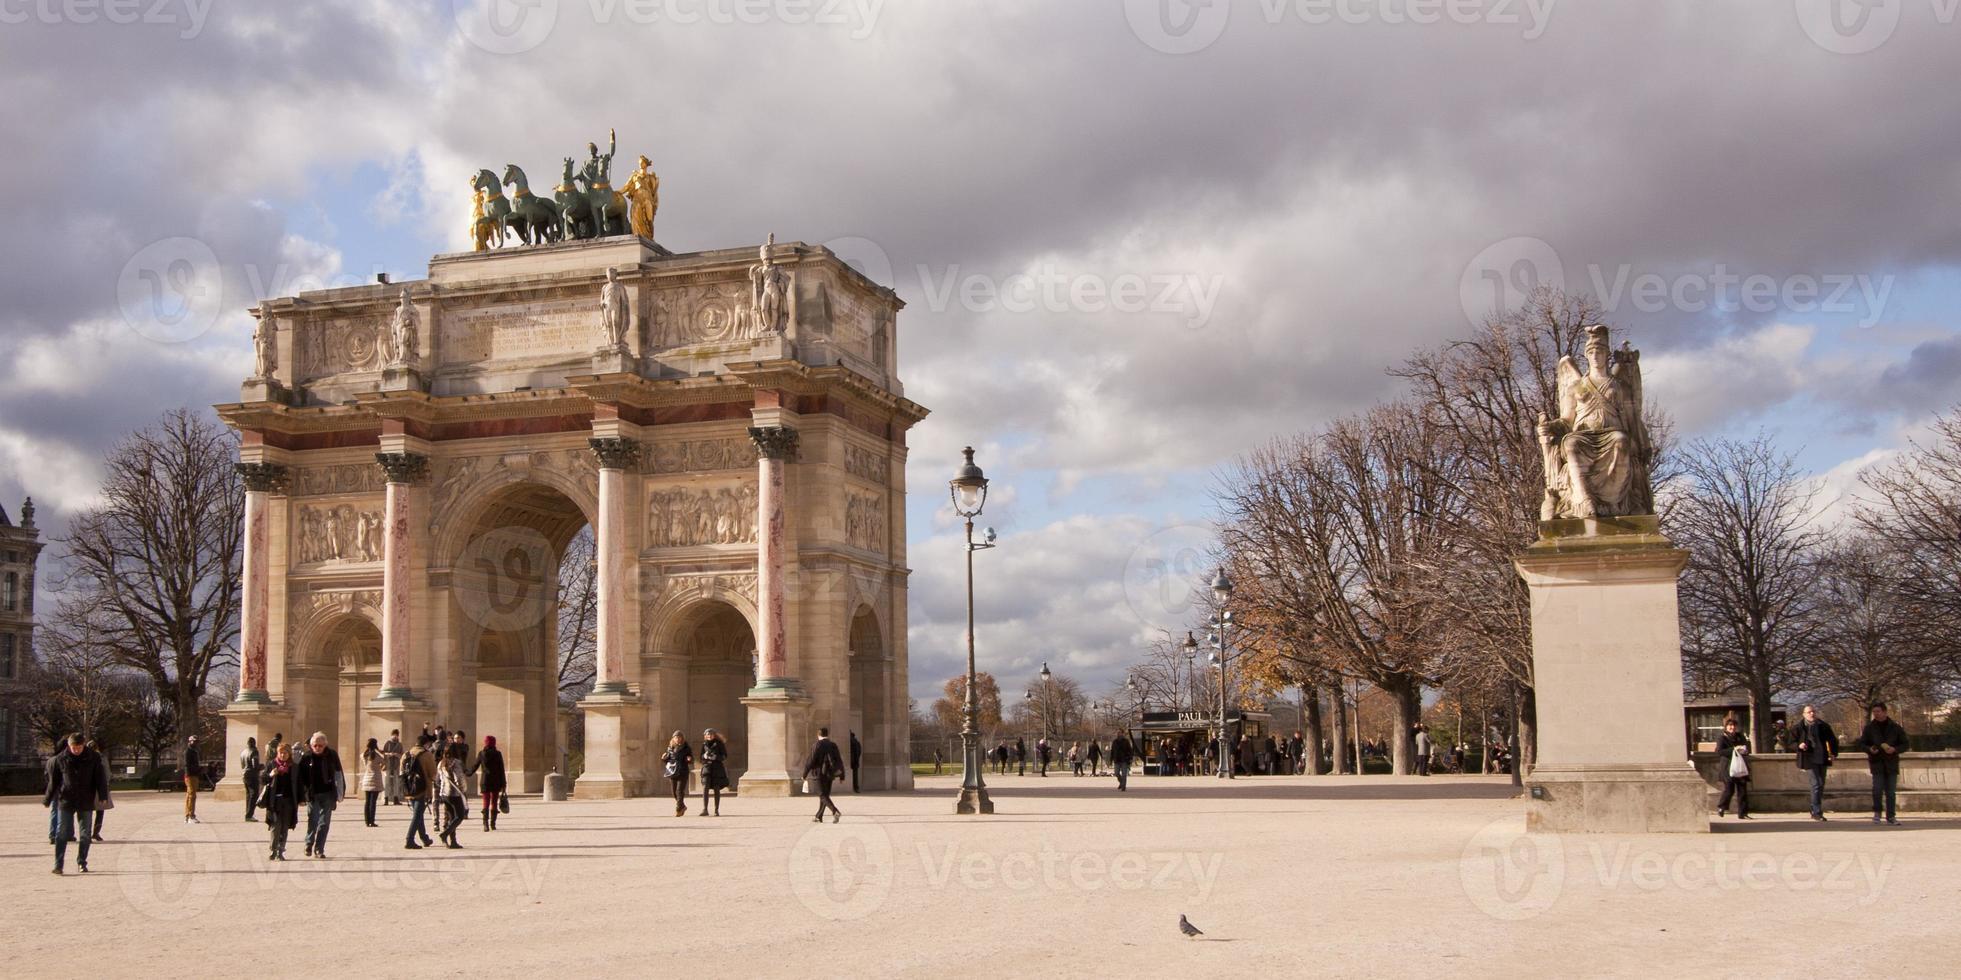 triomfboog, de arc de triomphe, parijs foto